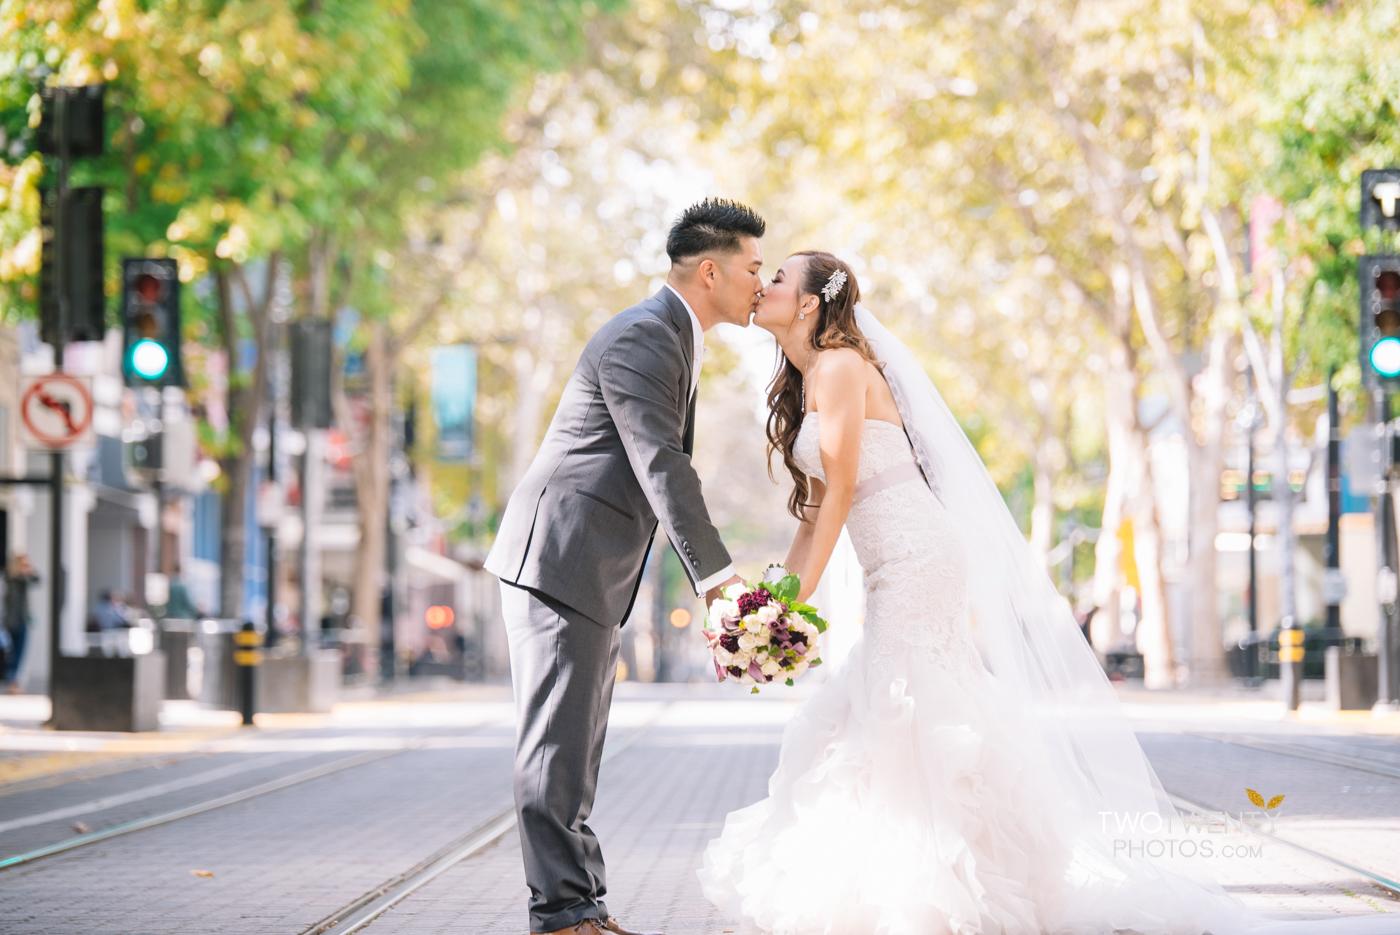 the-kay-ca-state-capital-downtown-sacramento-wedding-photographer-5